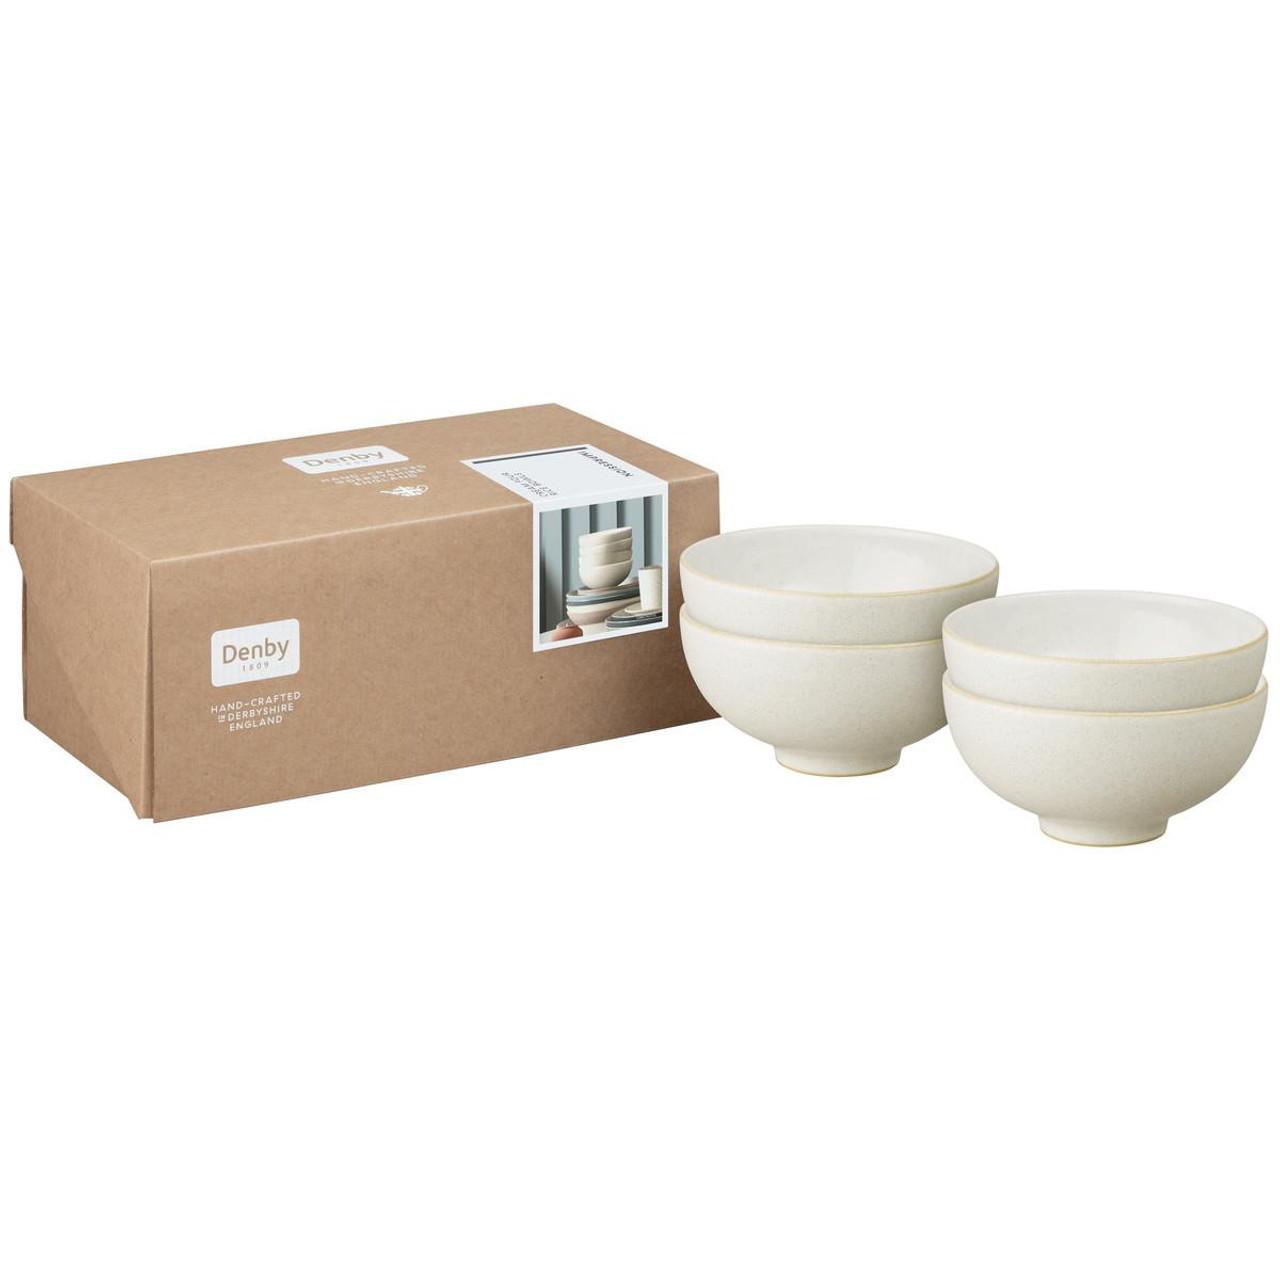 Denby Impression Cream Set Of 4 Rice Bowls